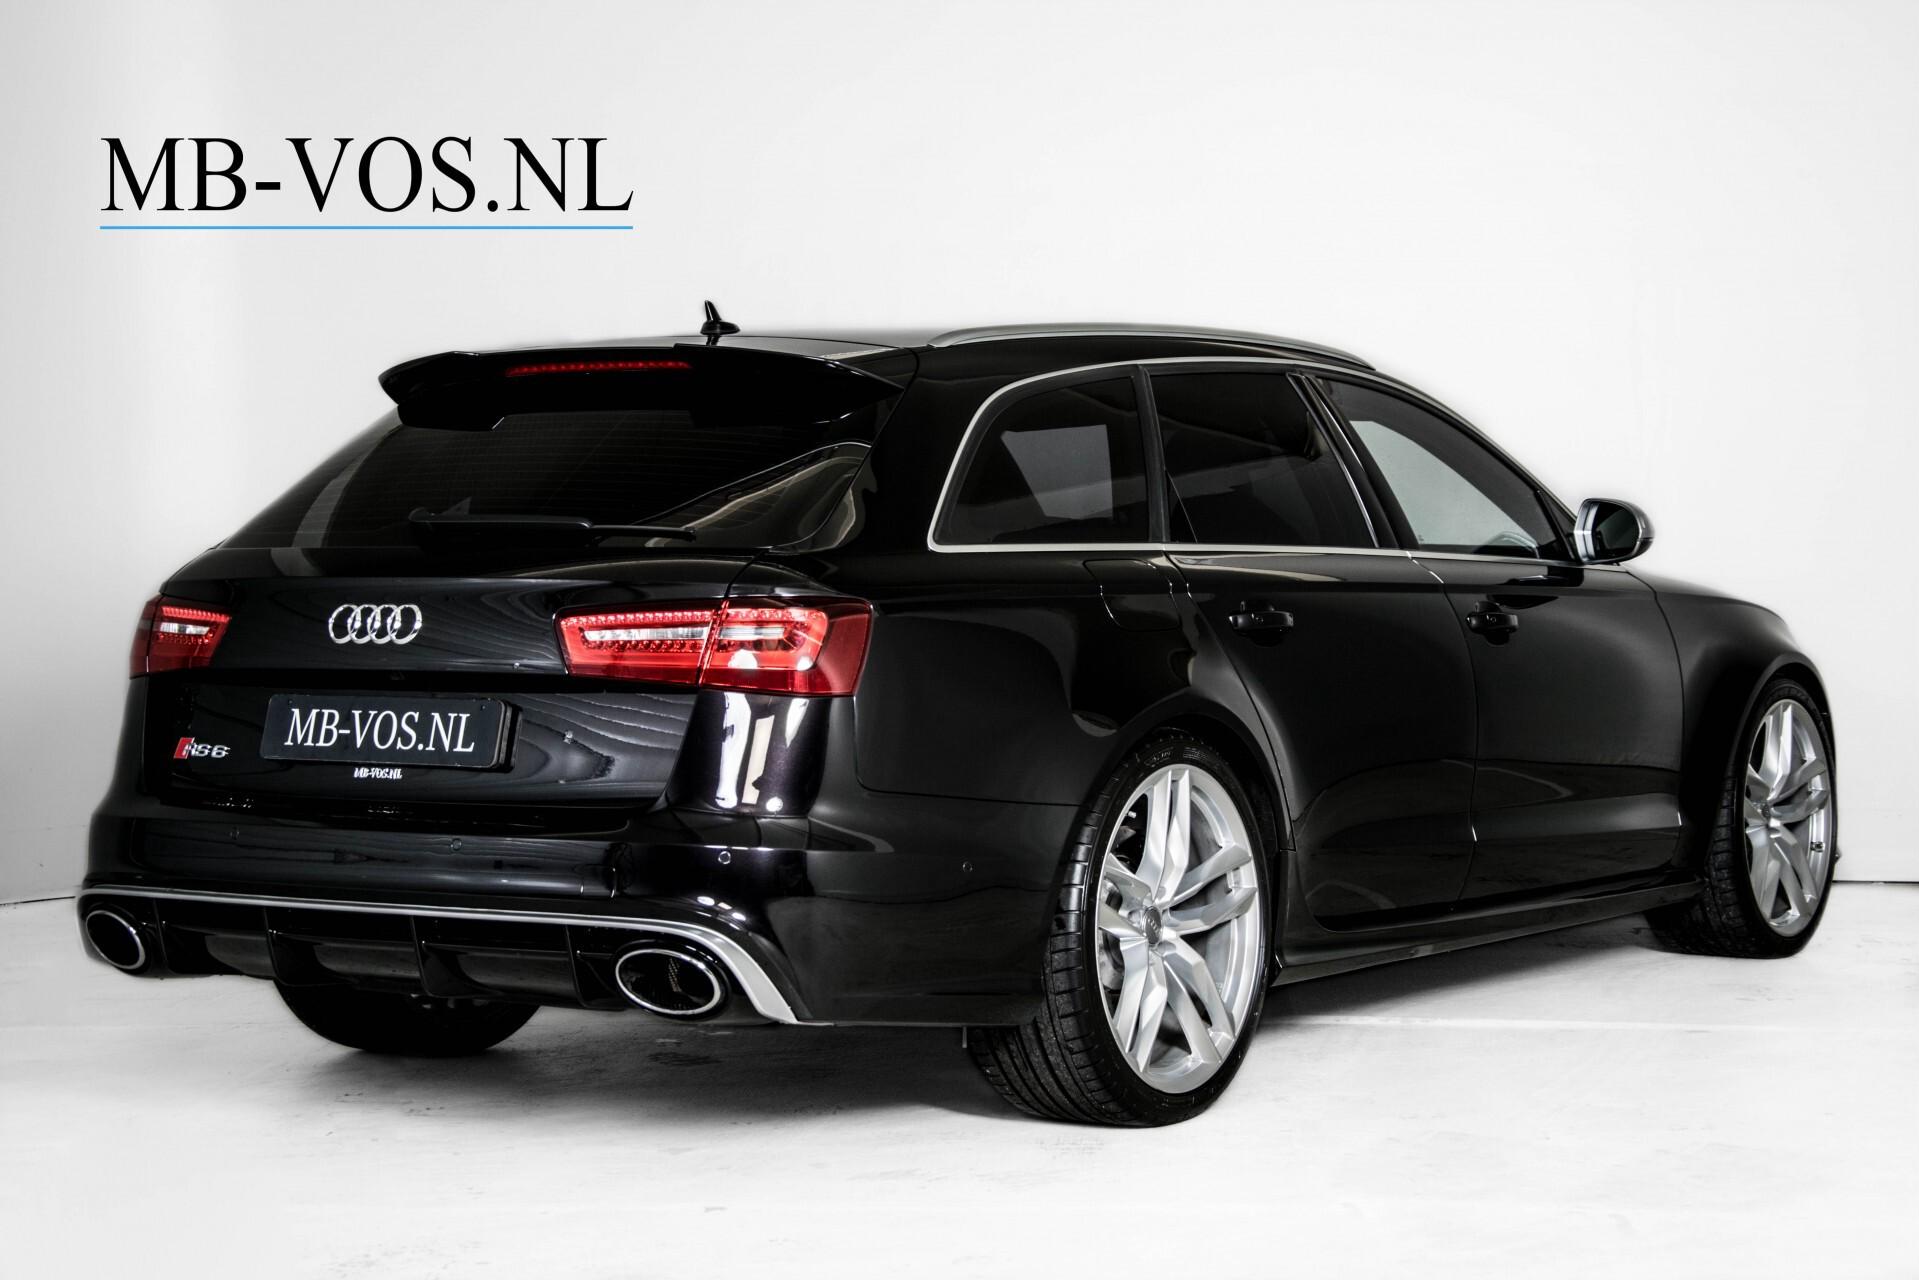 Audi RS6 Avant 4.0 TFSI Quattro B&O/Carbon/Head-Up/Nachtzicht/Exclusive/Camera/Keyless/Pano Aut8 Foto 2